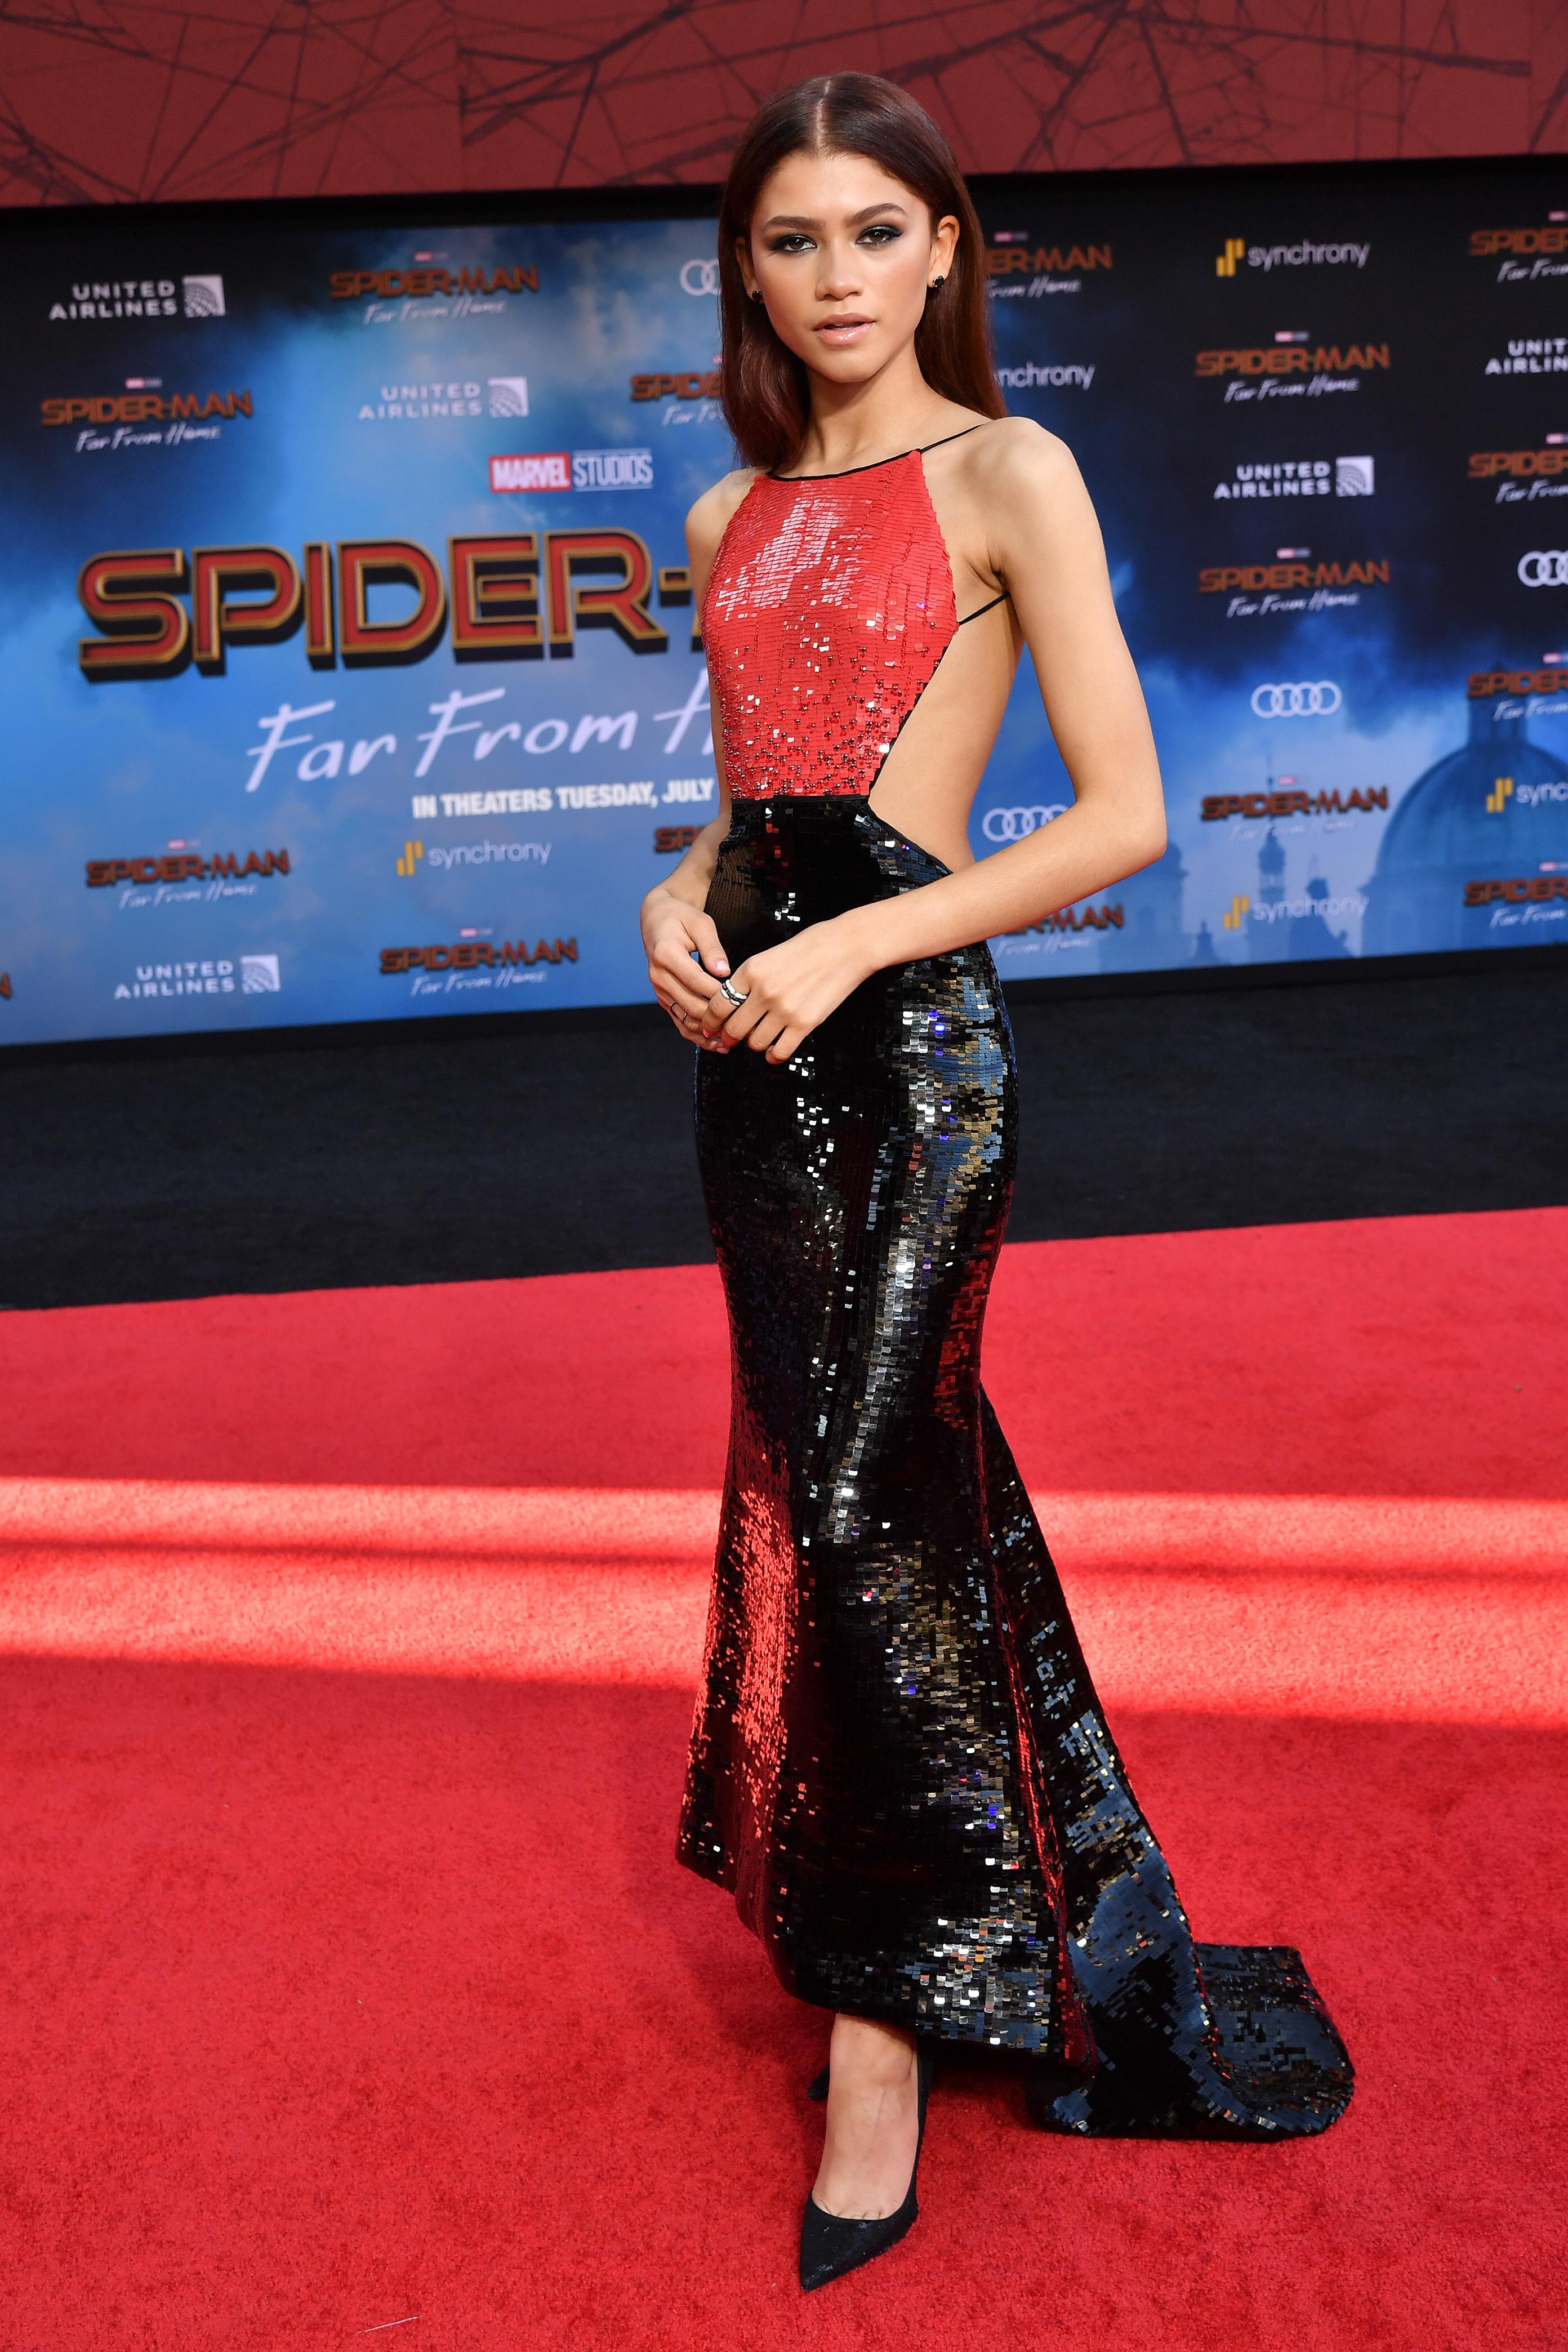 Zendaya Spider Man Far From Home Press Tour Fashion